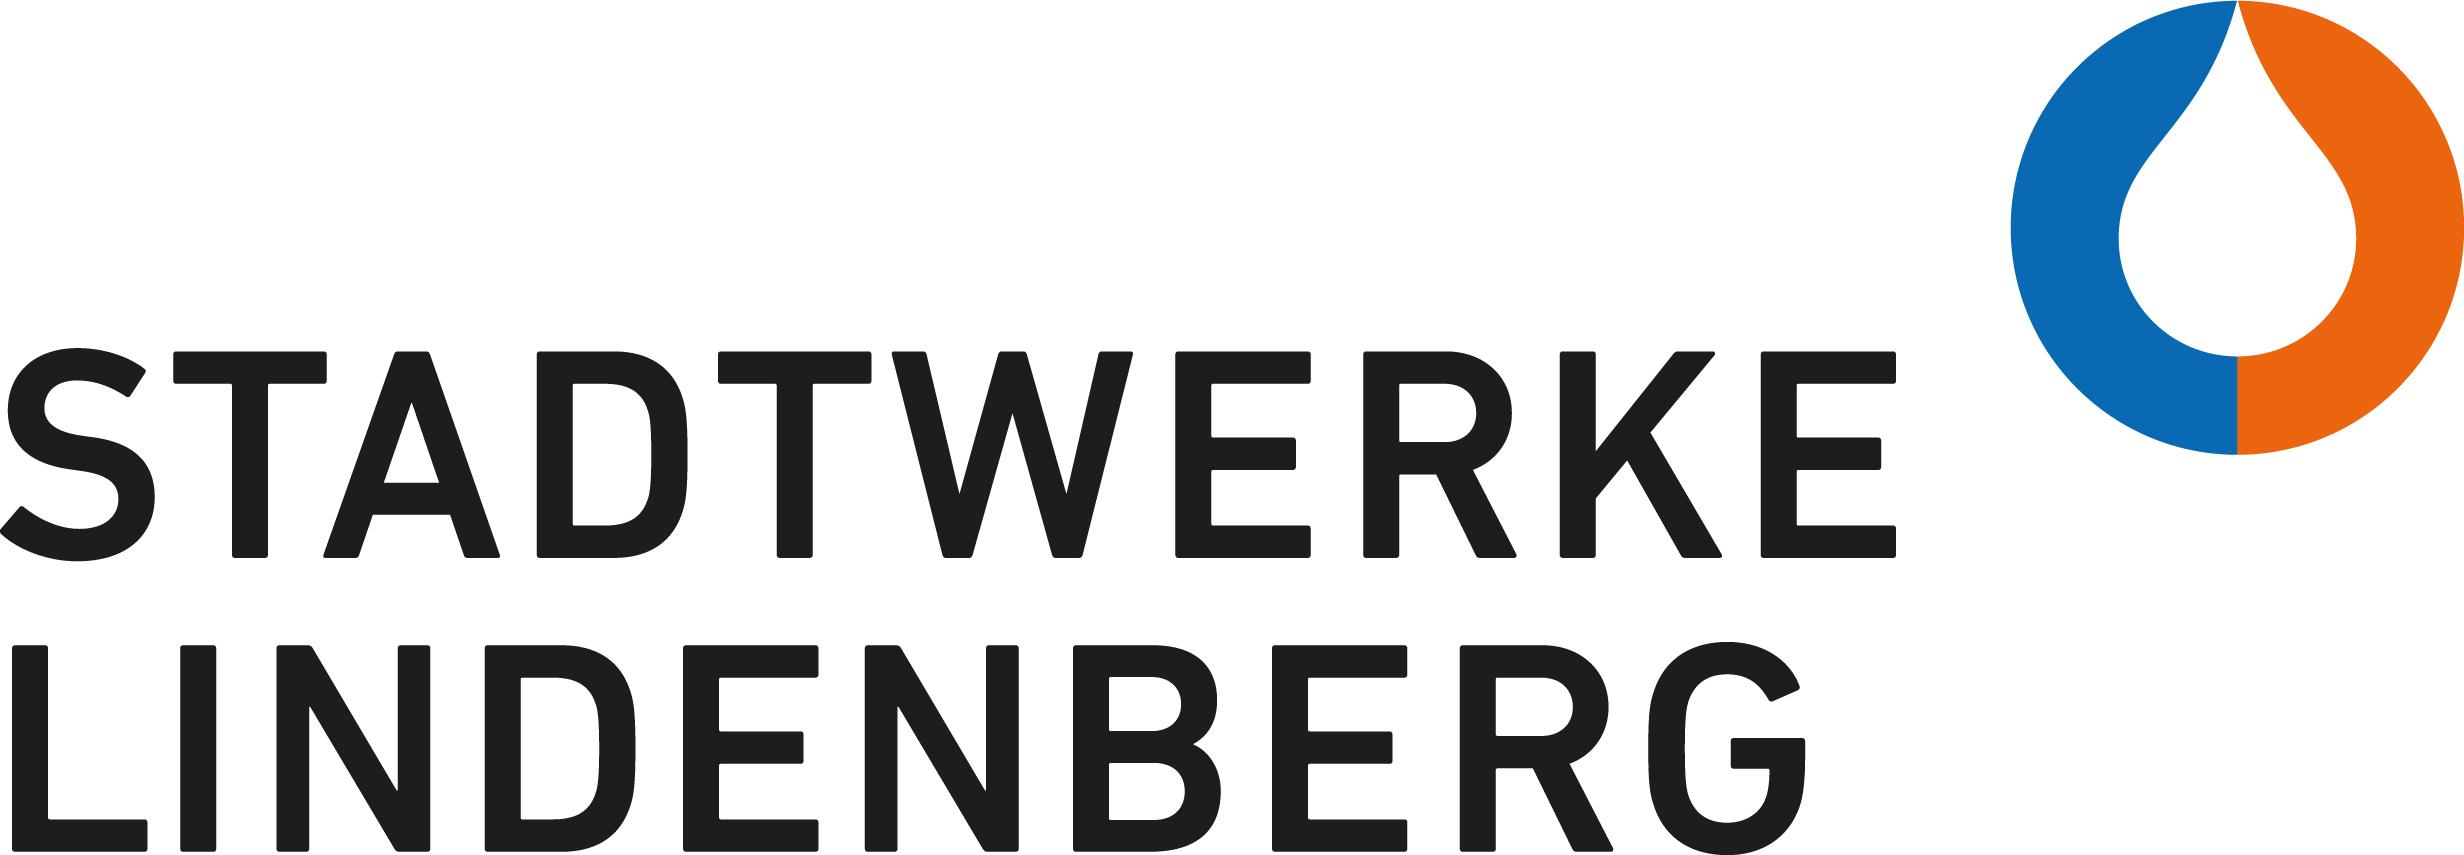 Logo Stadtwerke Lindenberg – E-MAKS-Kunde